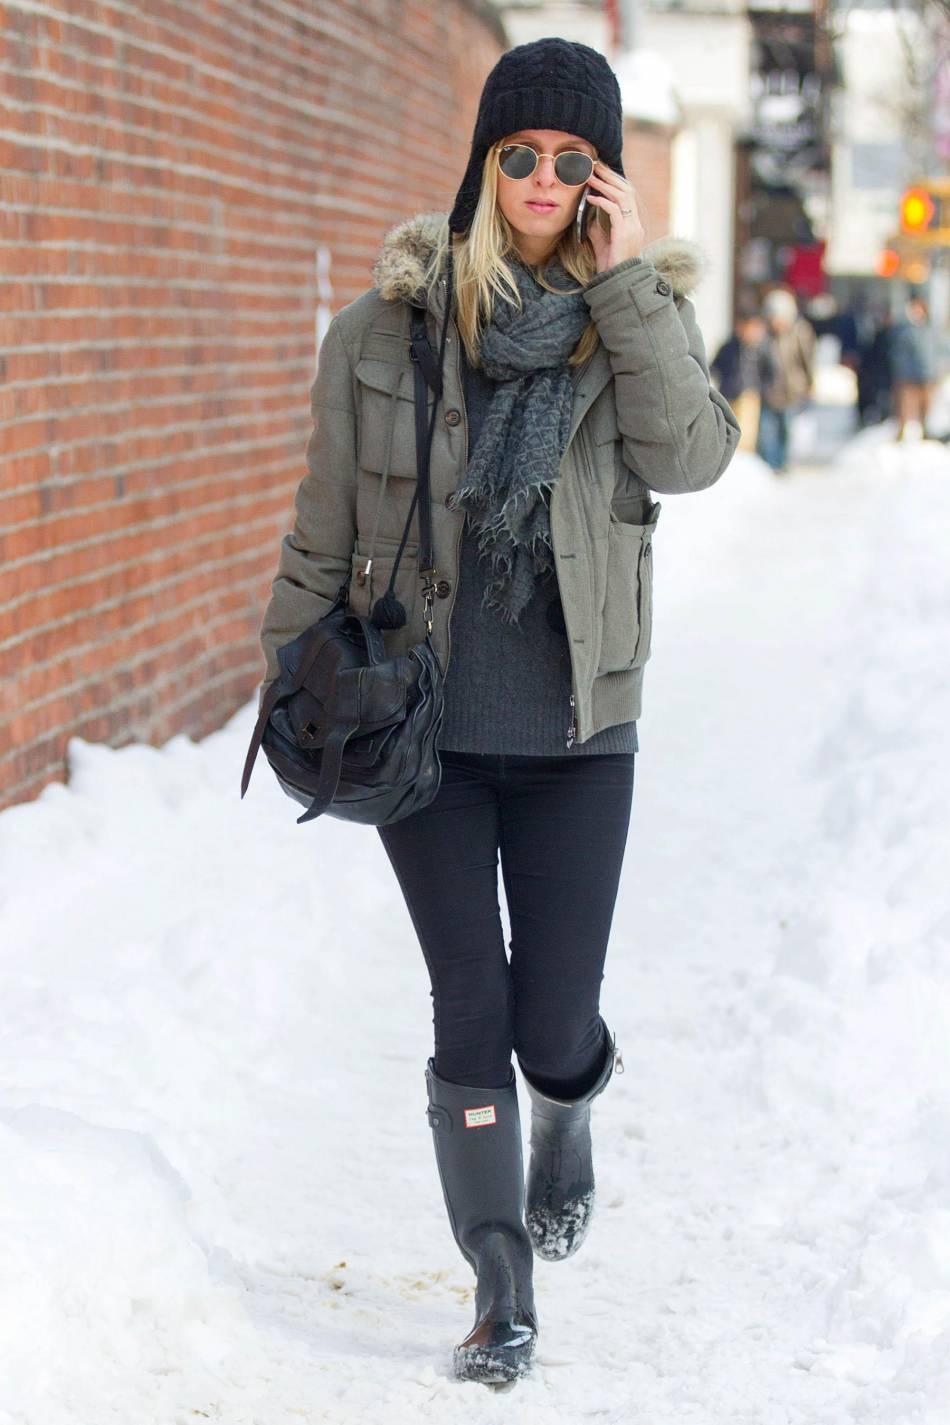 Nicky Hilton adopte un look hivernal très confortable.